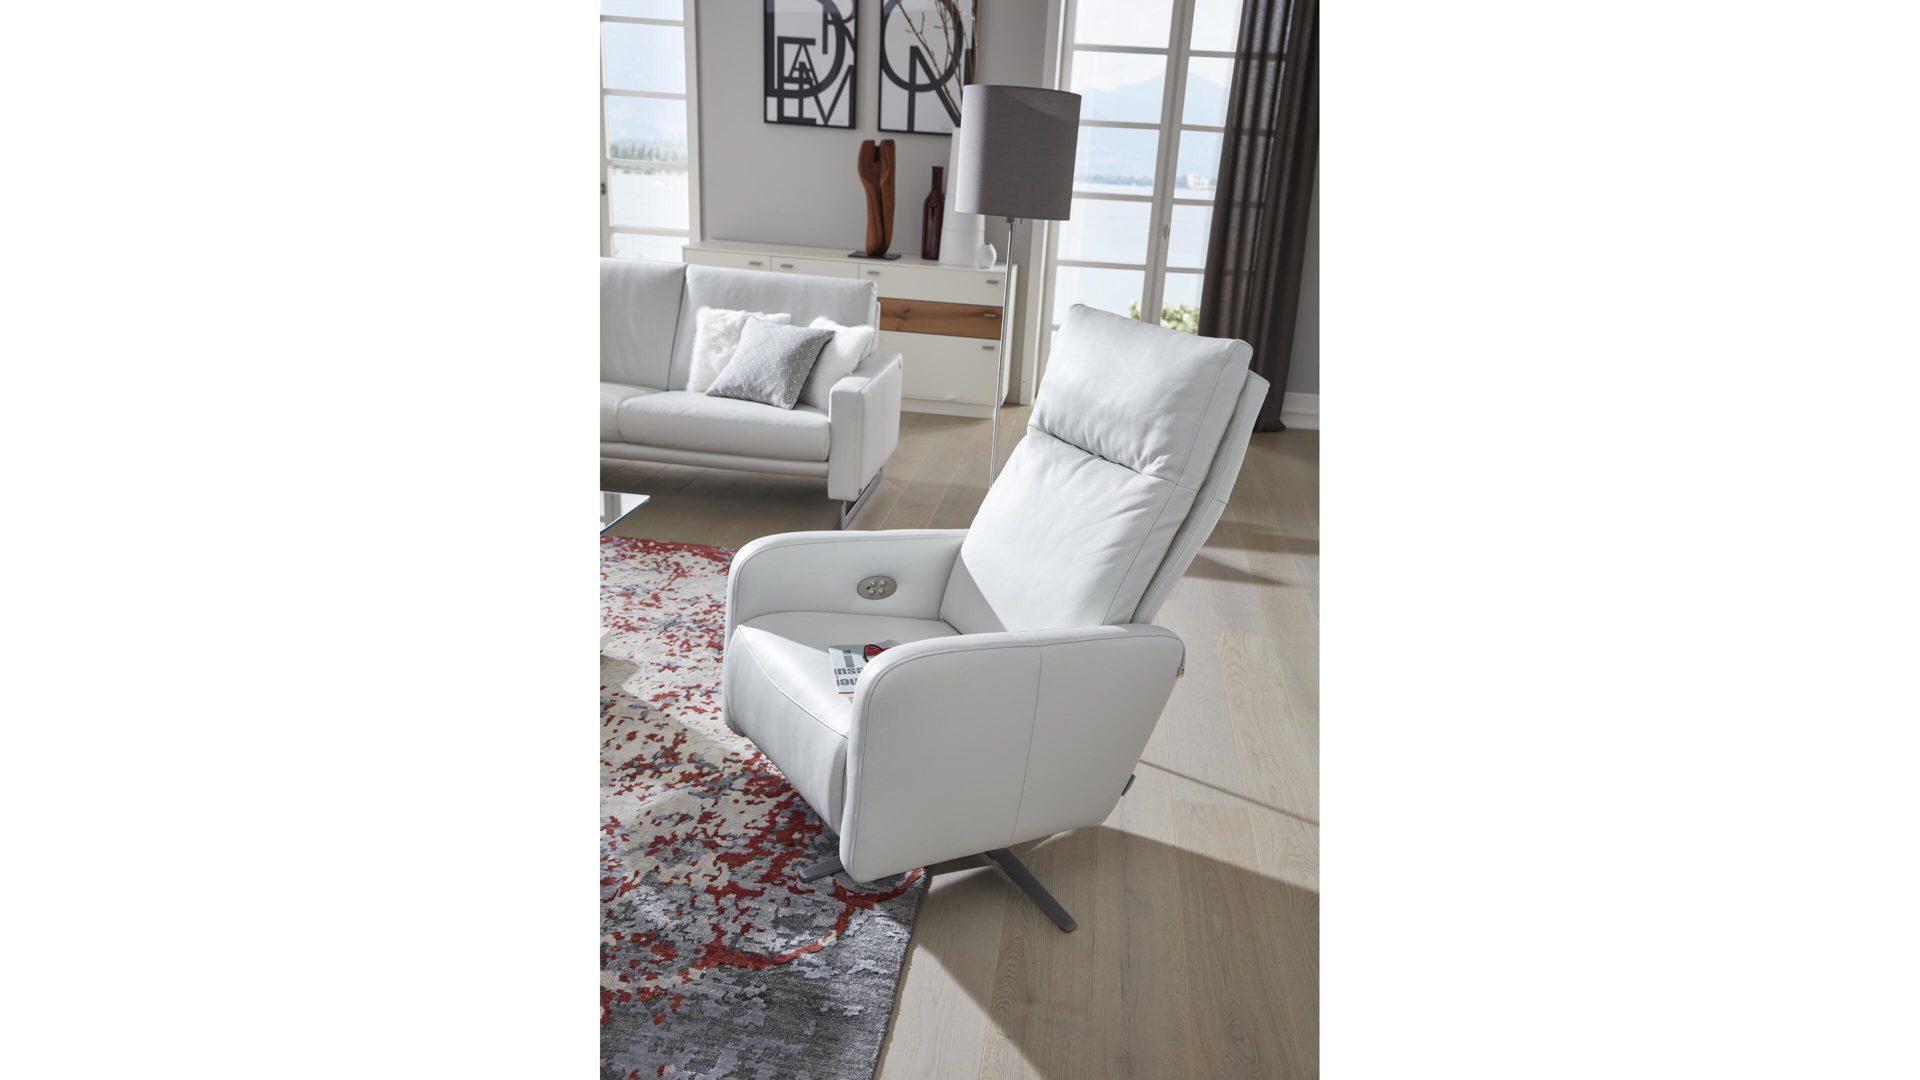 Interliving Sessel Serie 4501 Polstermöbel Weißes Leder Z59 42